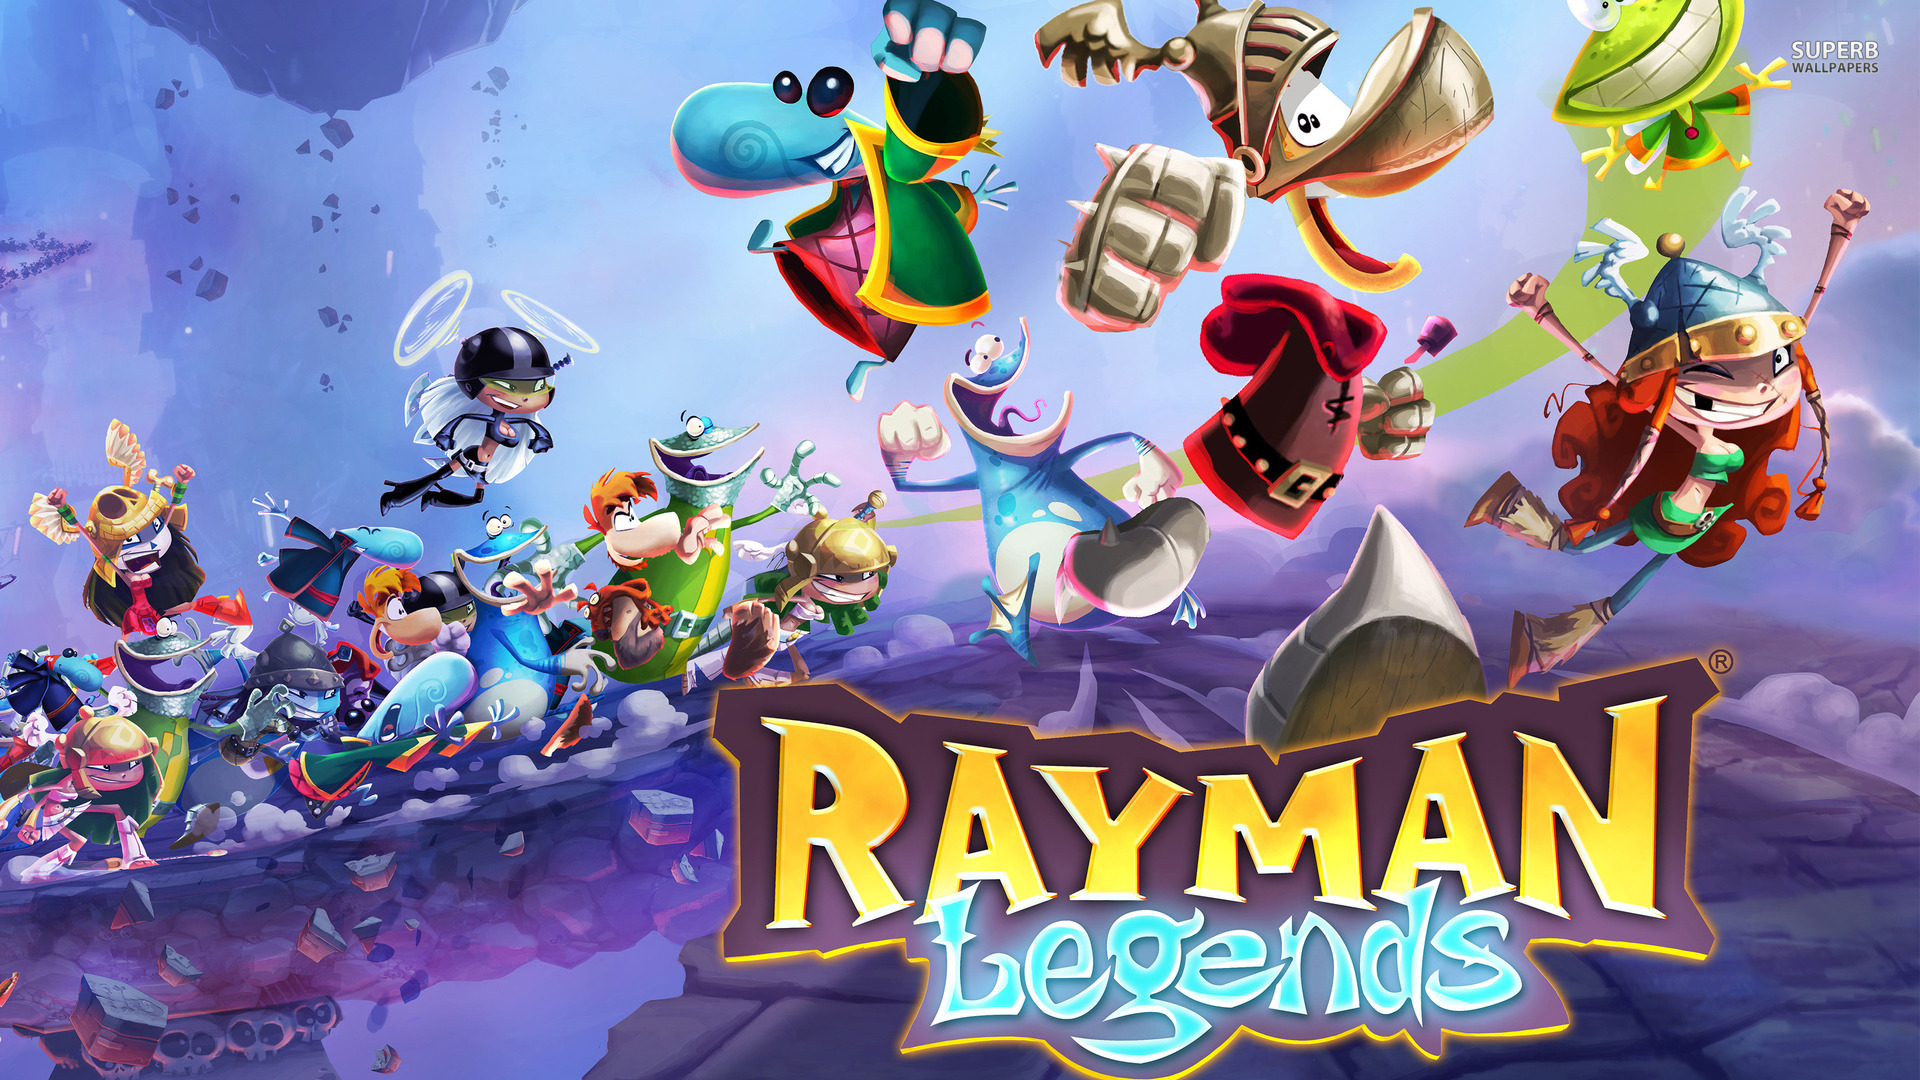 rayman-legends-21455-1920x1080.jpg